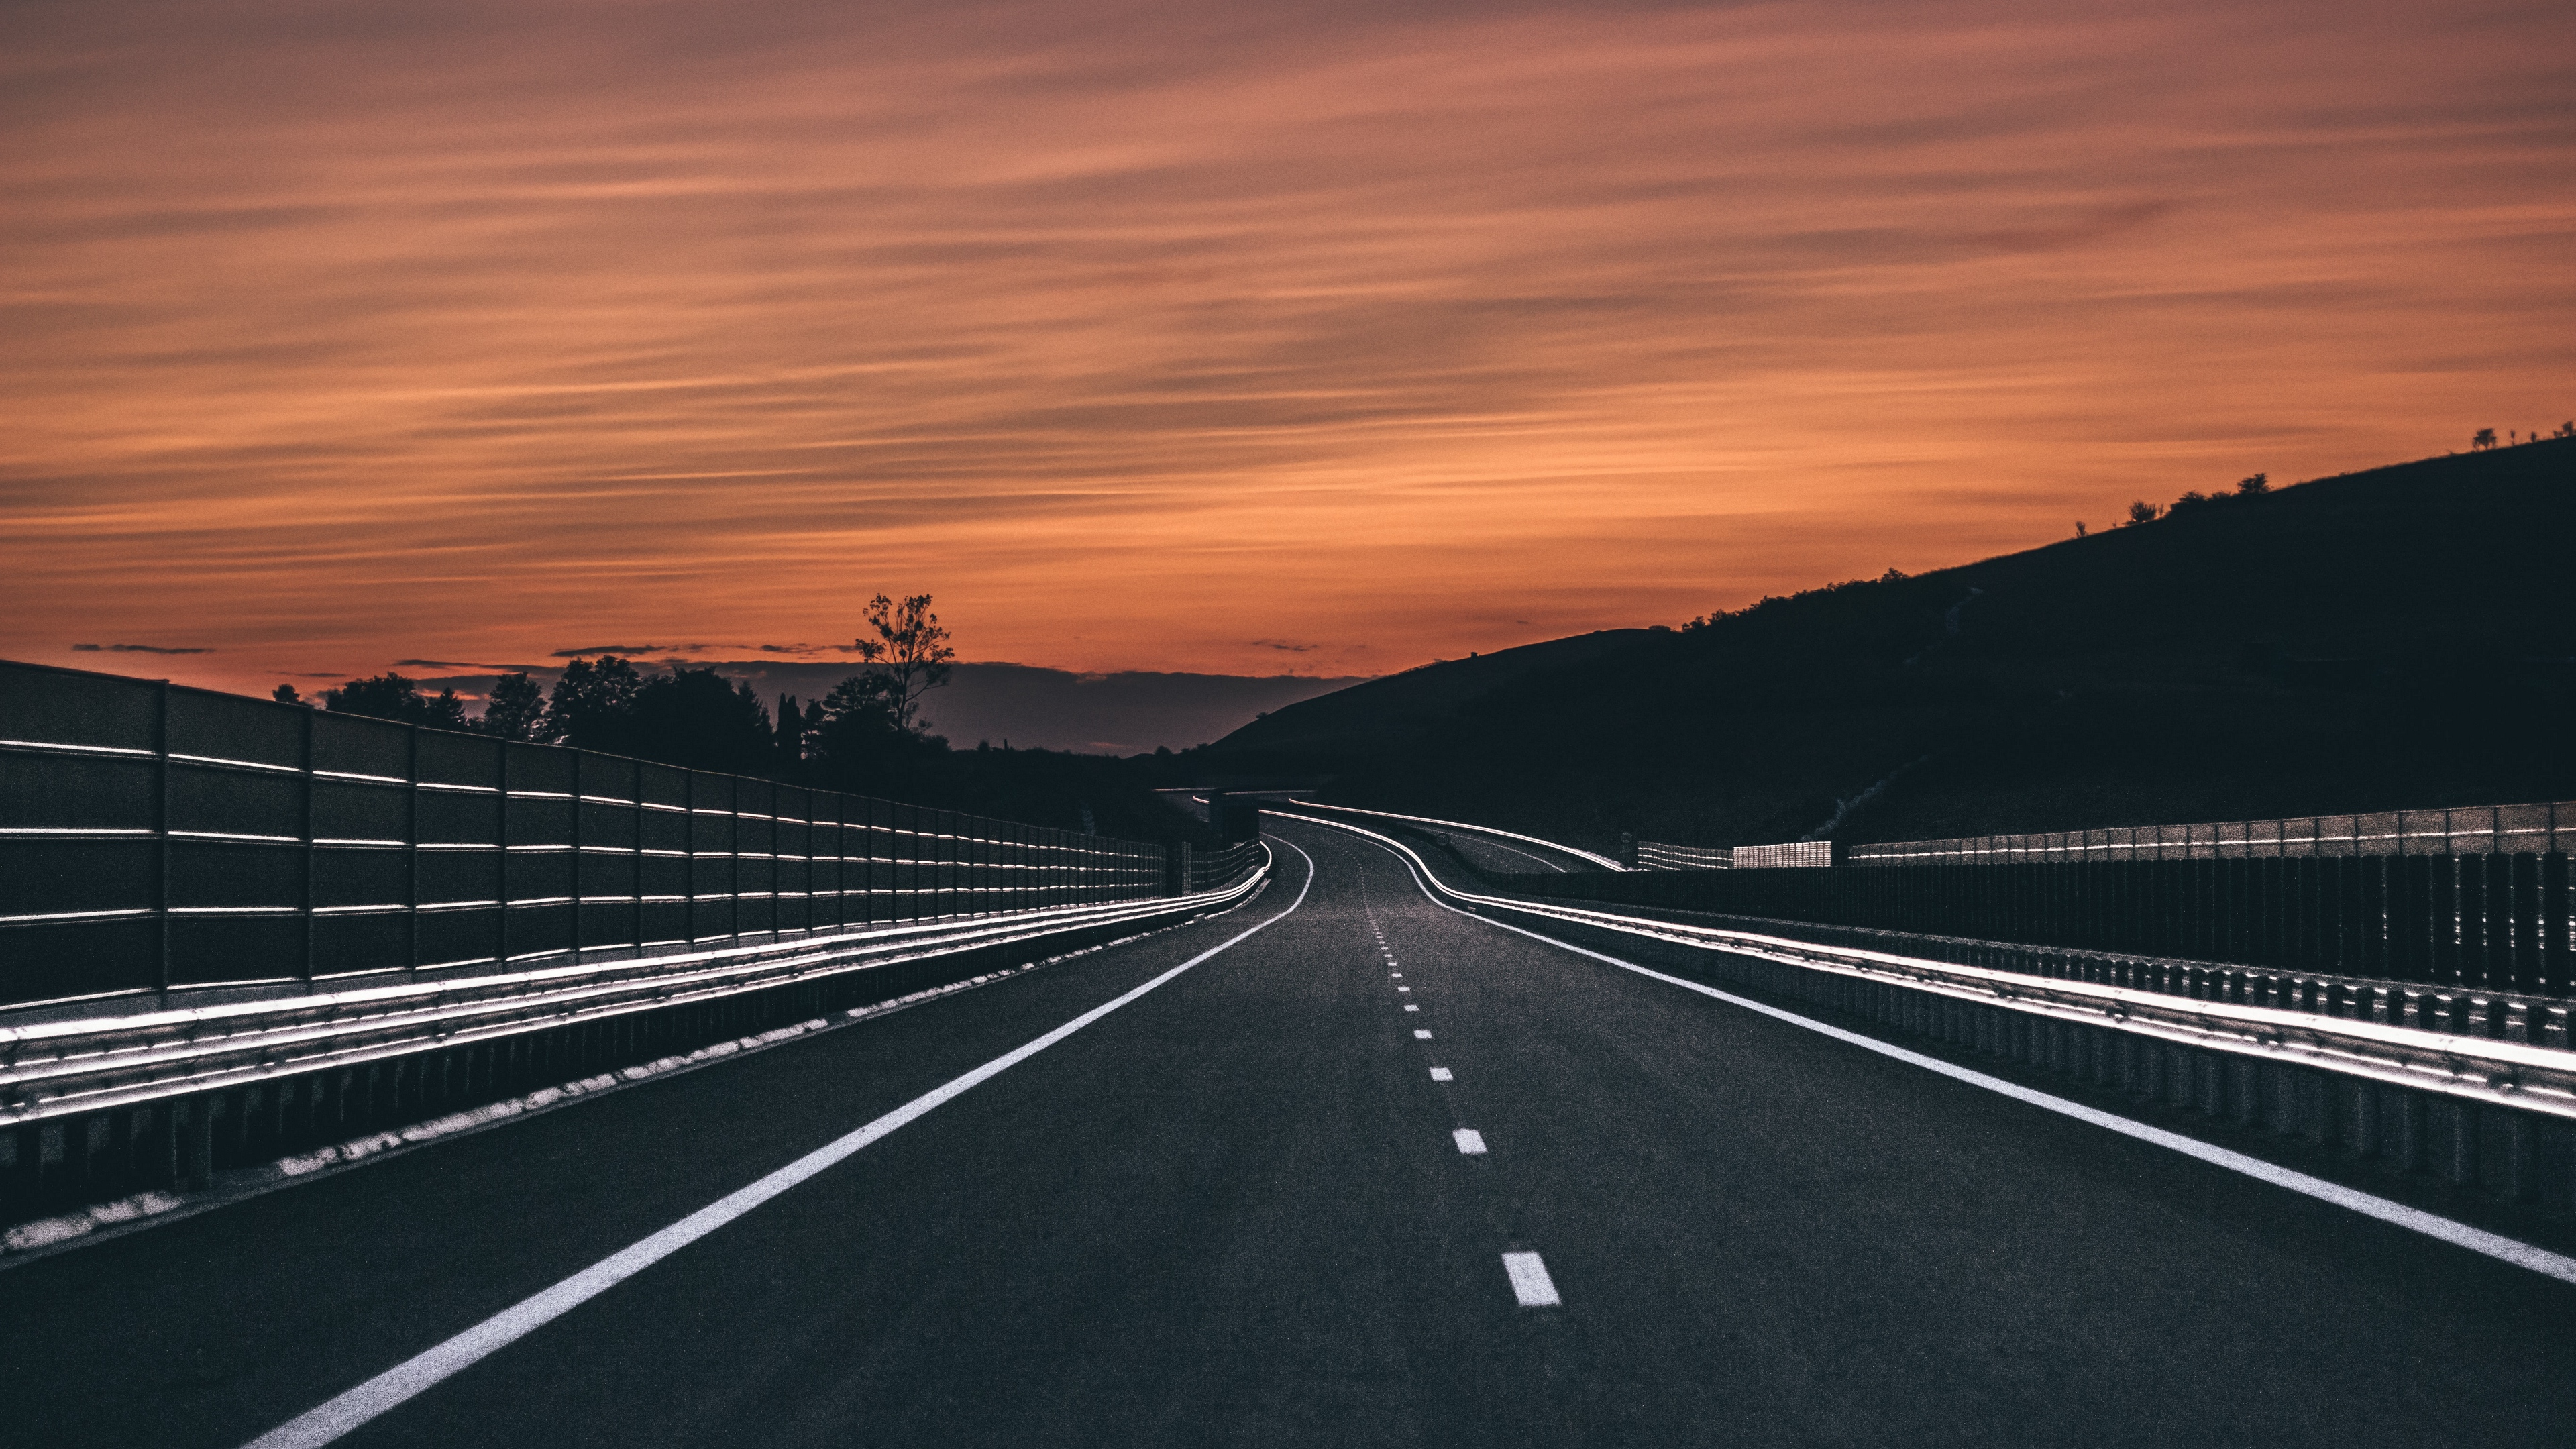 road marking asphalt sunset horizon 4k 1541117199 - road, marking, asphalt, sunset, horizon 4k - Road, marking, asphalt